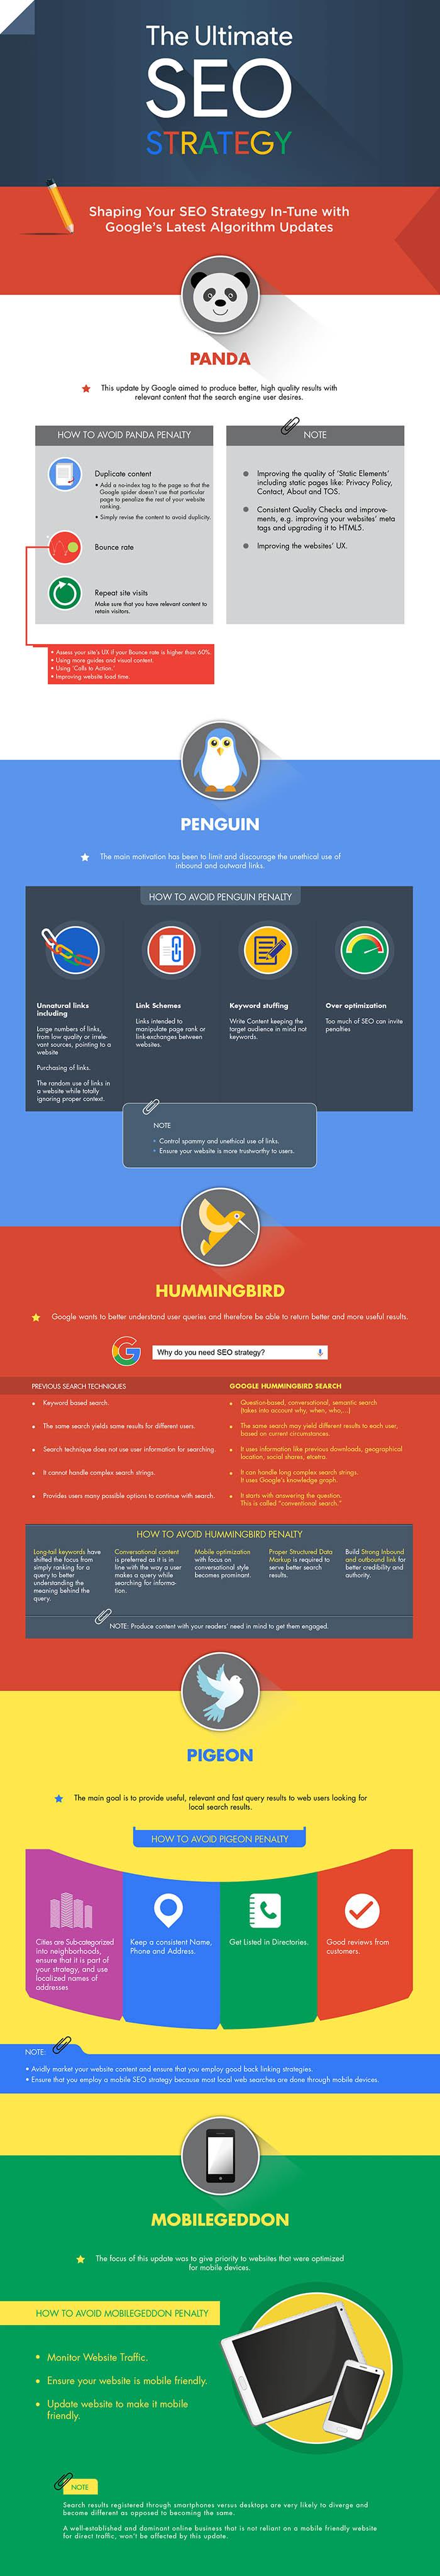 algoritm-evita-penalizarile-Google-SEO